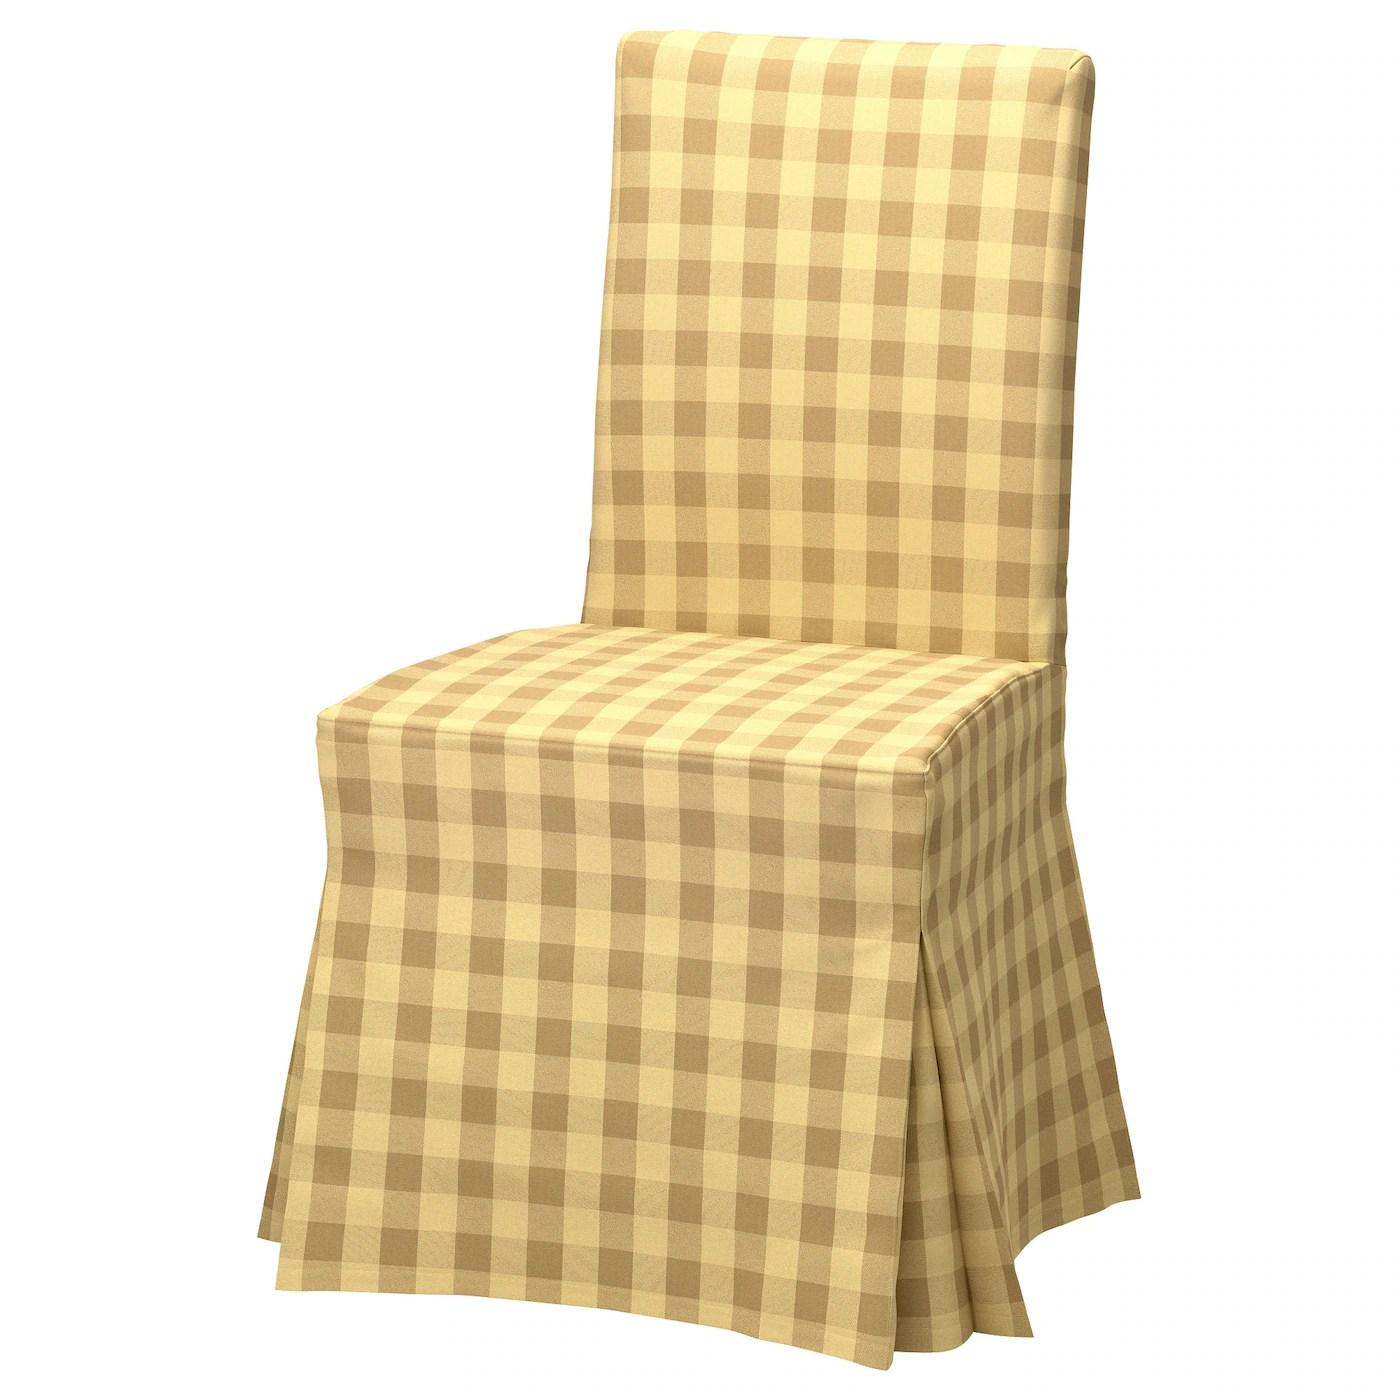 washing ikea chair covers baby pillow chairs ireland dublin